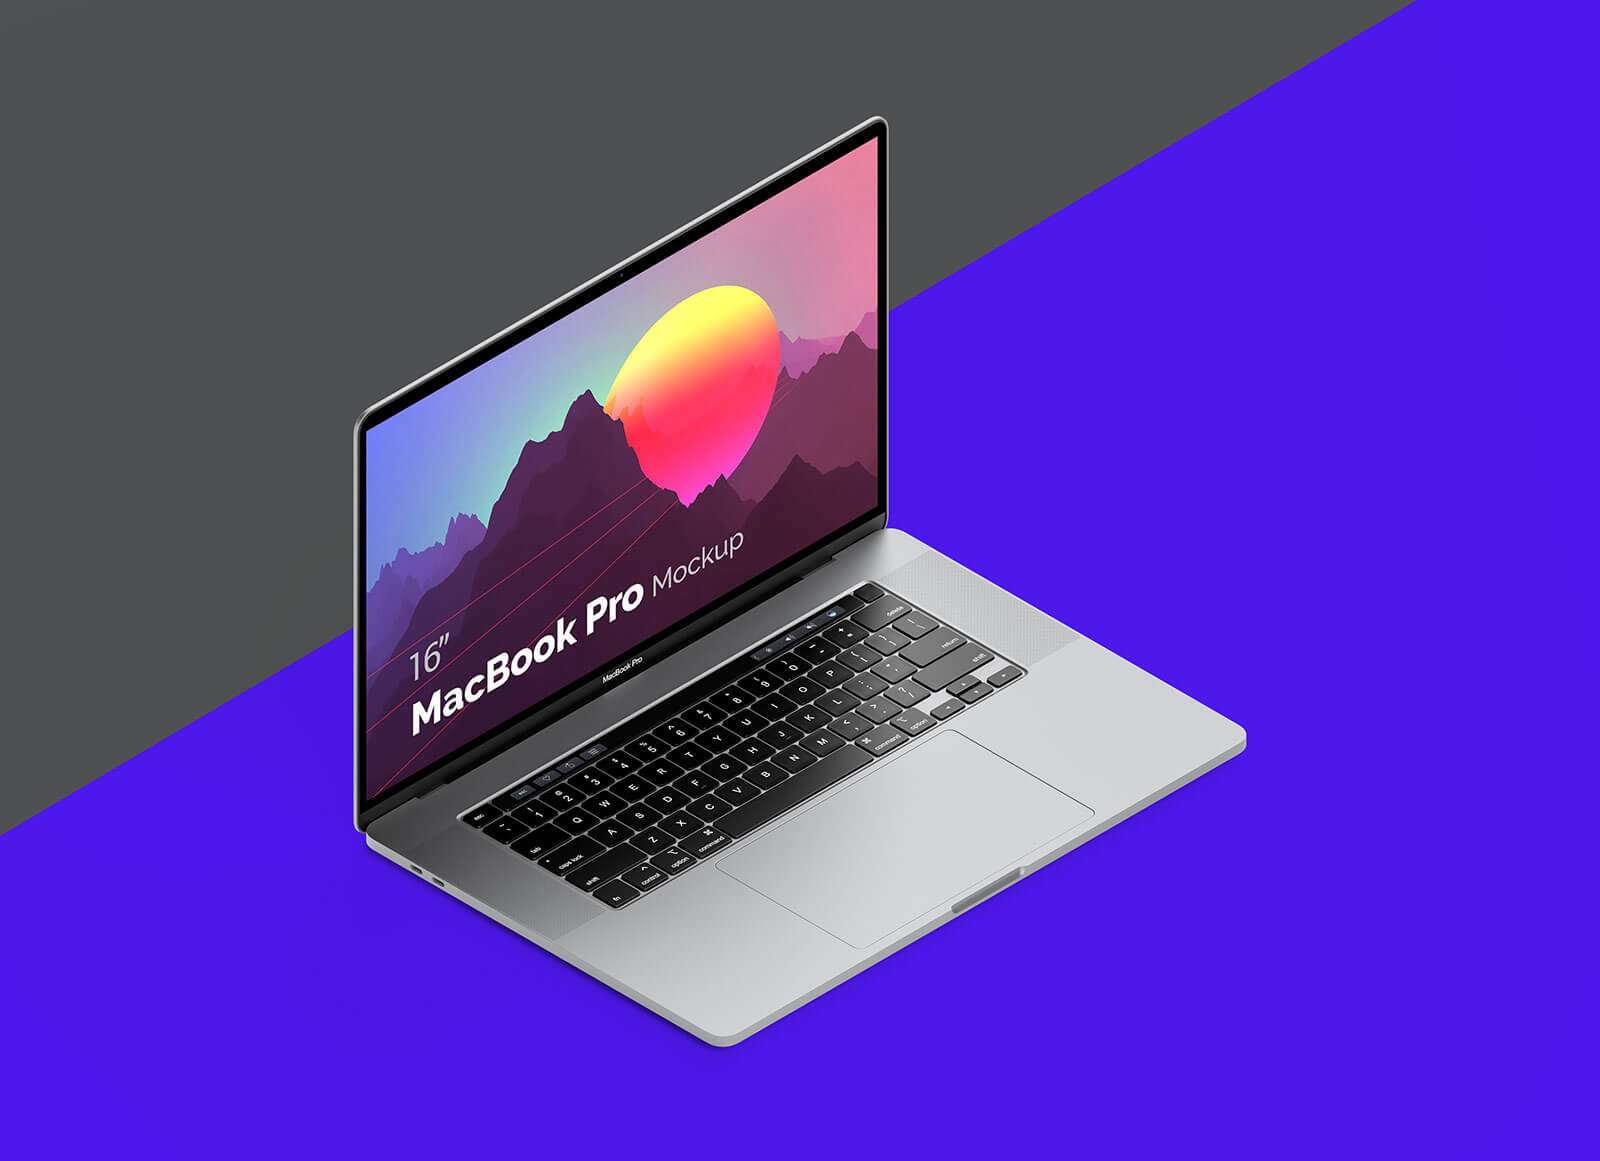 Free-Isometric-16-Inches-Apple-MacBook-Pro-2020-Mockup-PSD